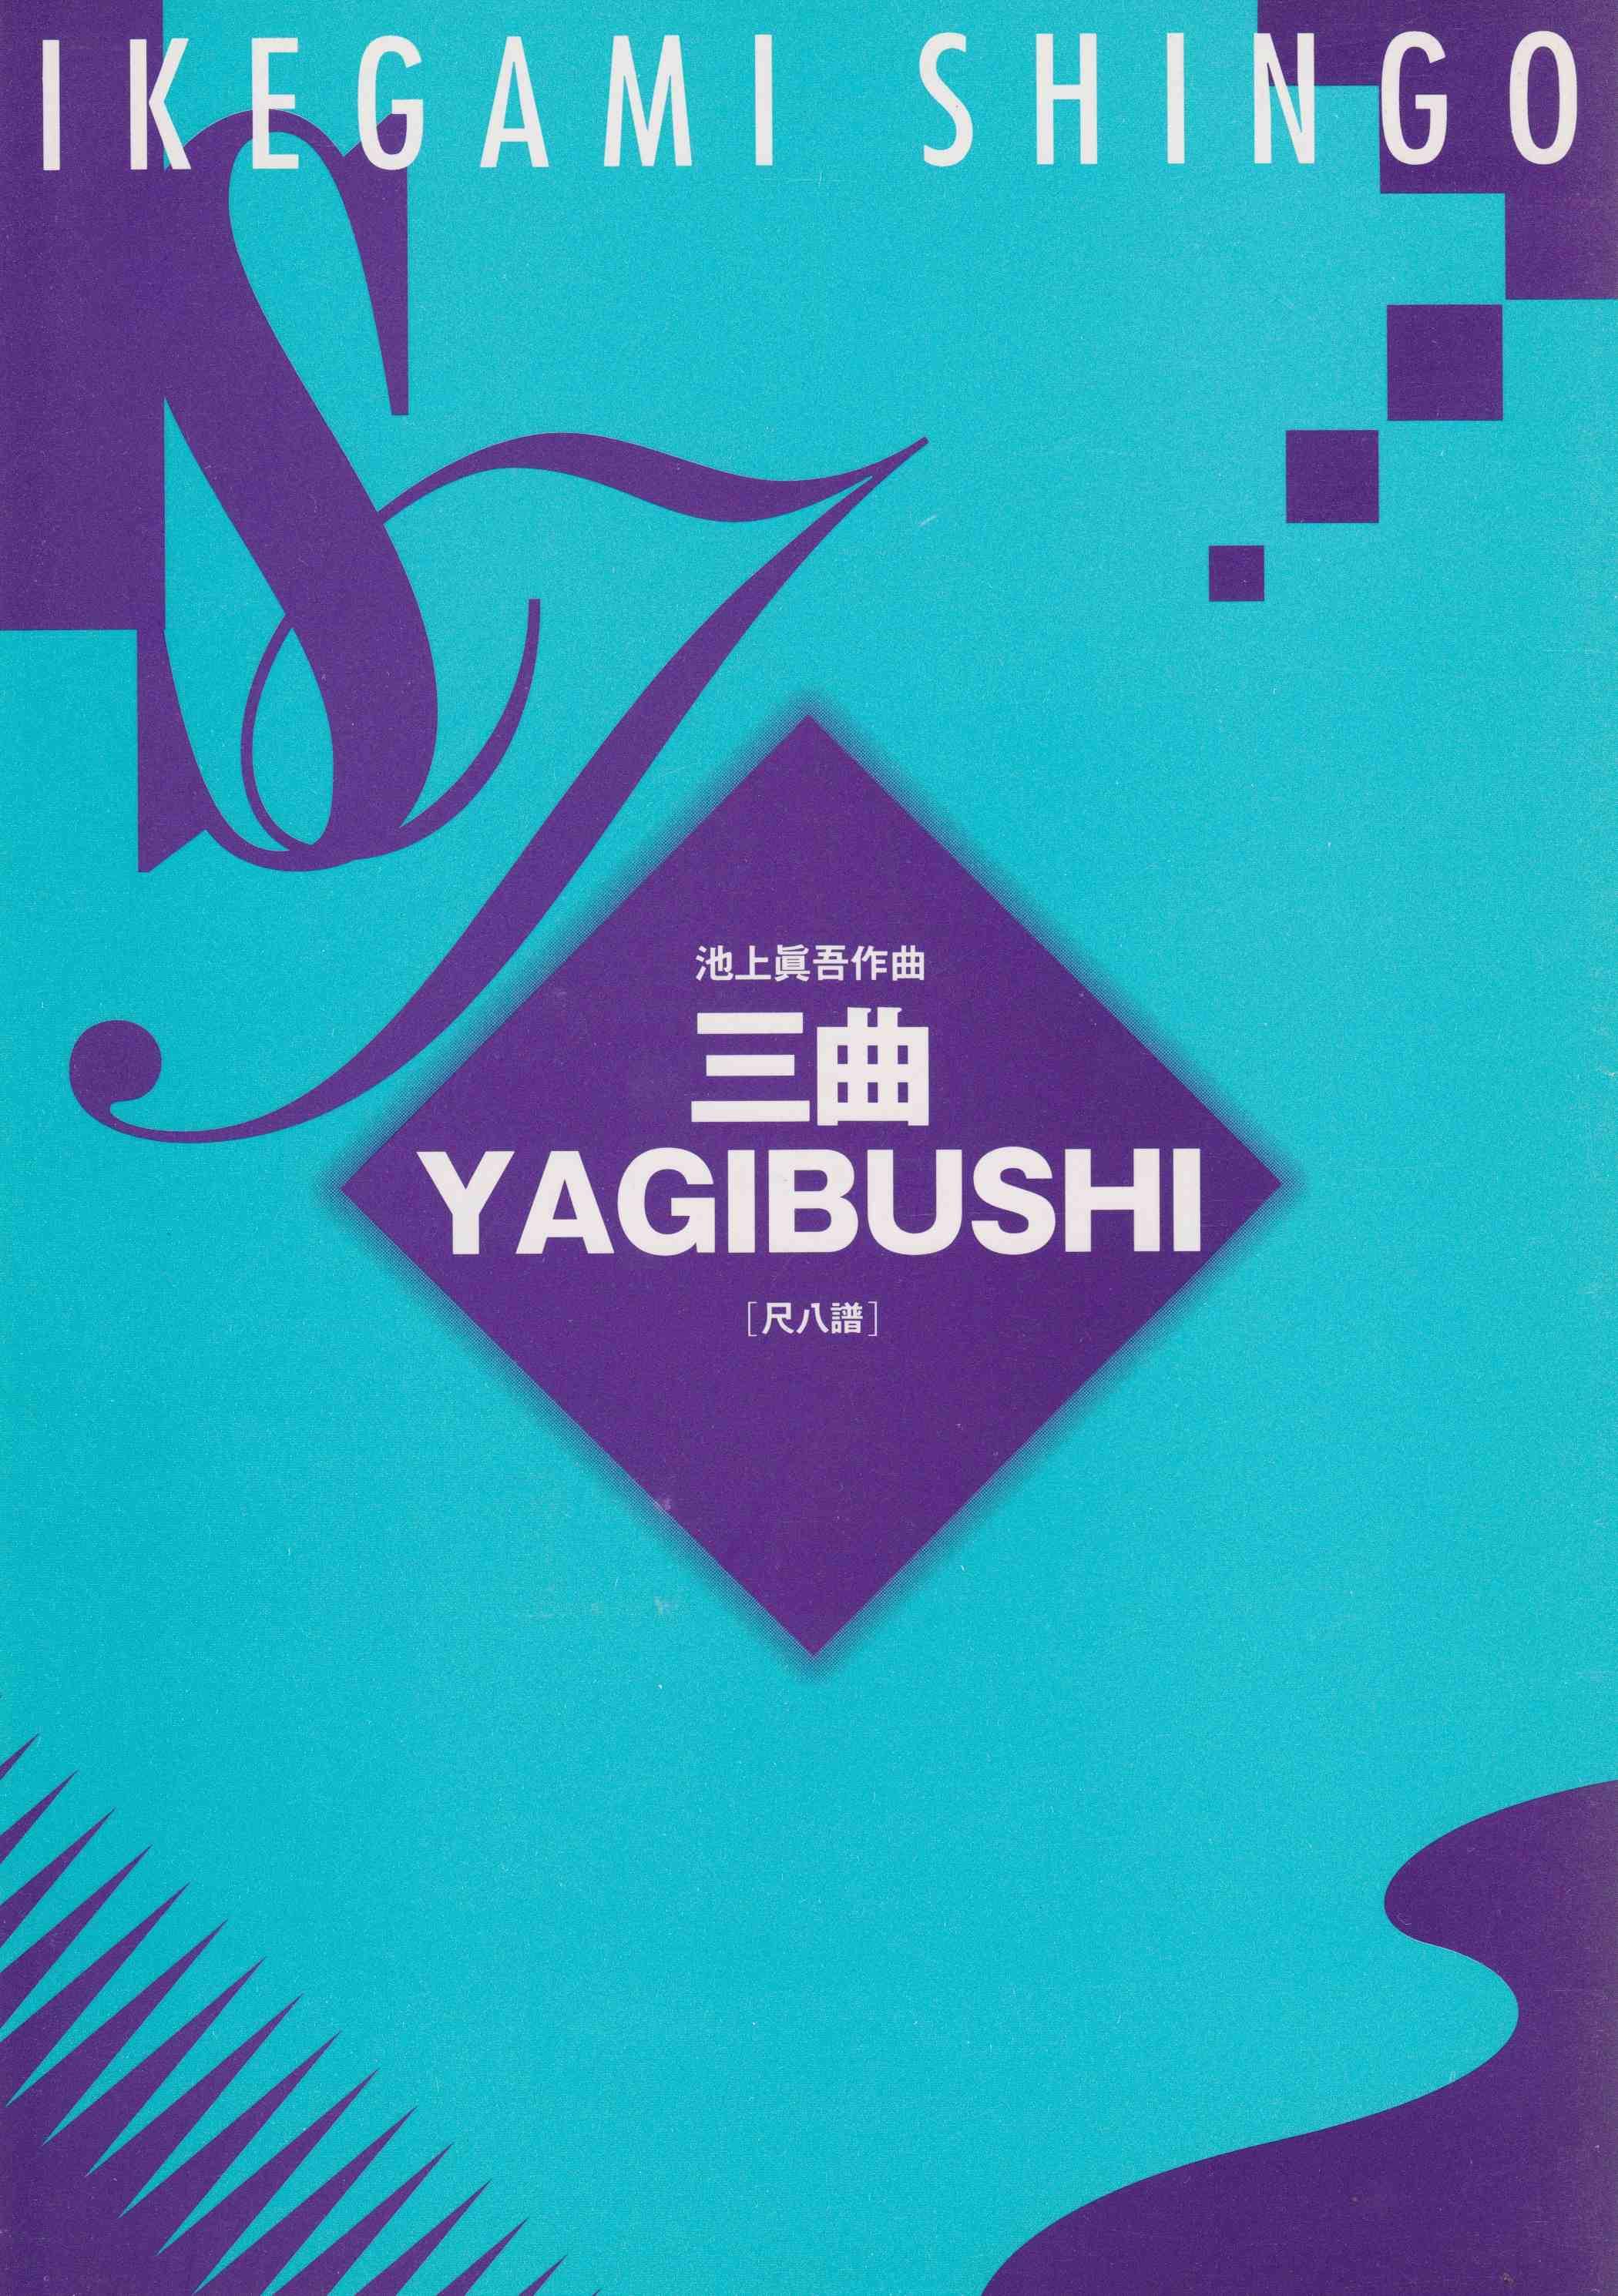 三曲YAGIBUSHI(尺八譜)[5064-2]